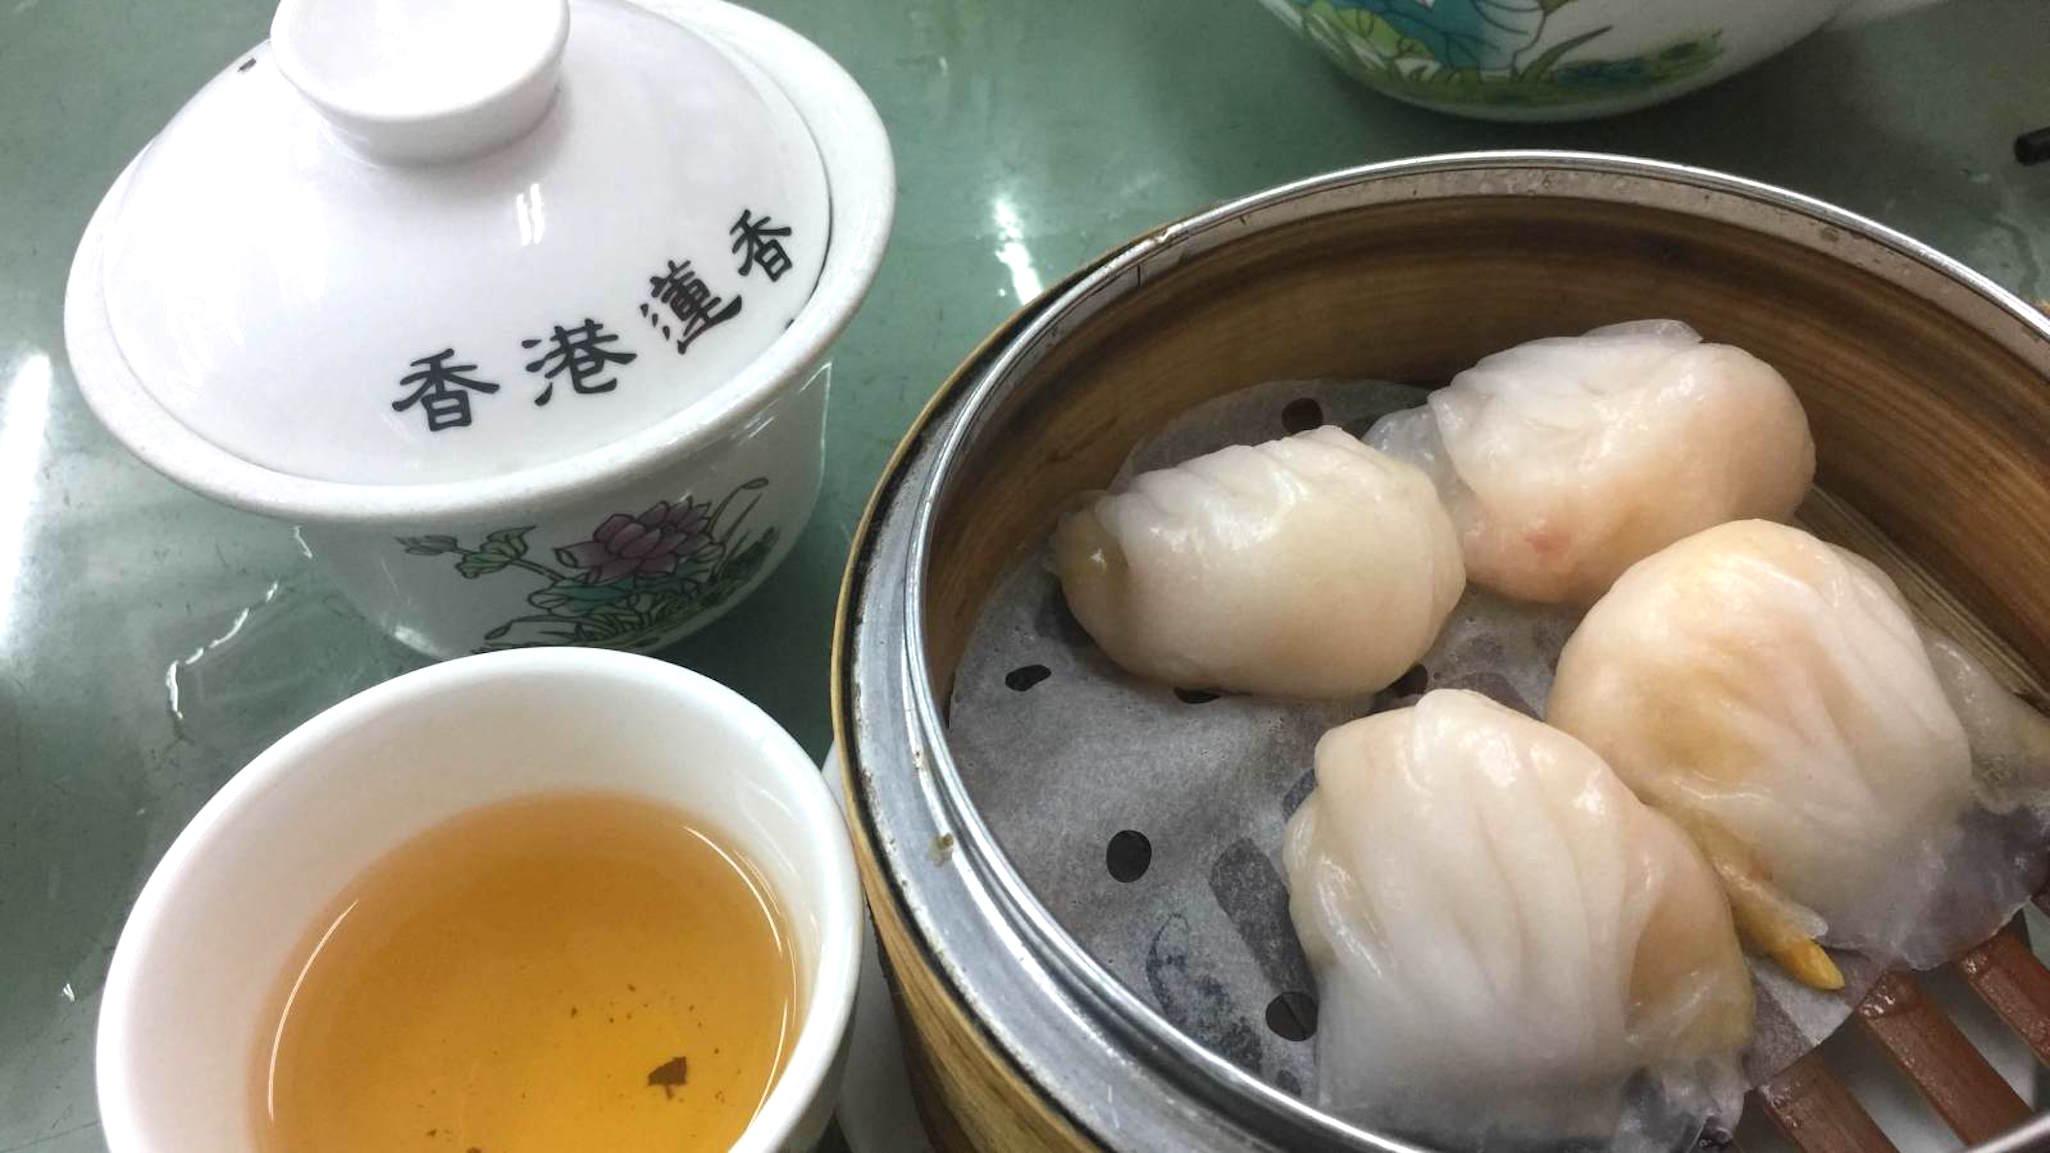 Small Group Tour: Hong Kong Island Food Tour